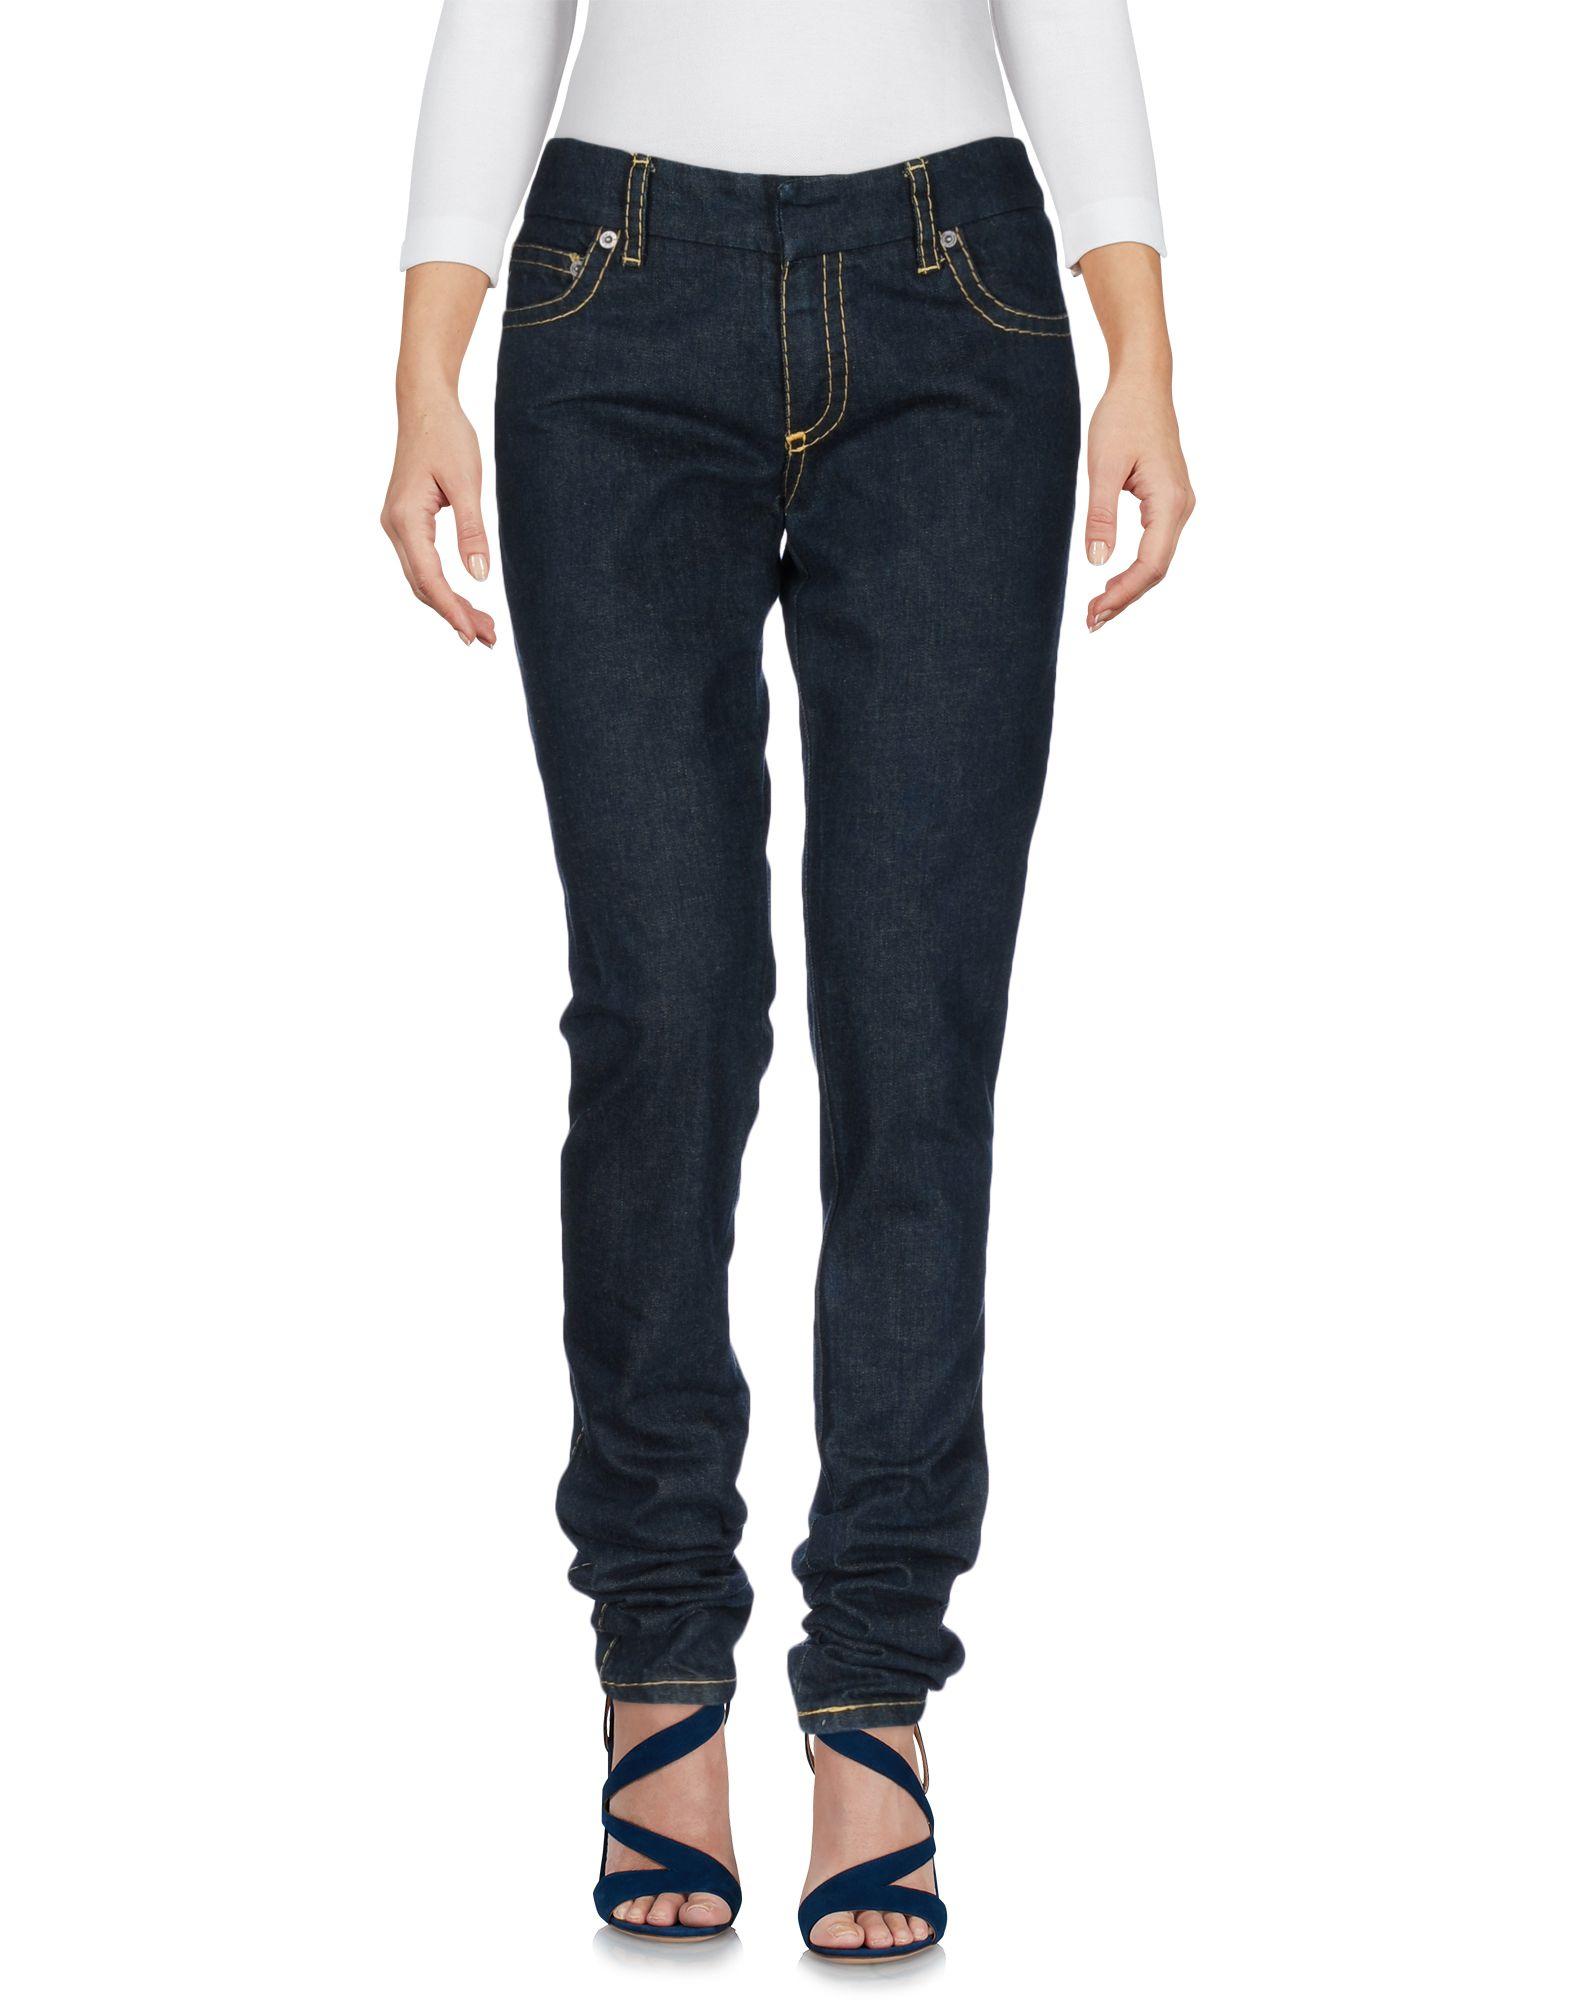 John En Femmes À Ligne Pantalon jeans RichmondAcheter CQshrdt